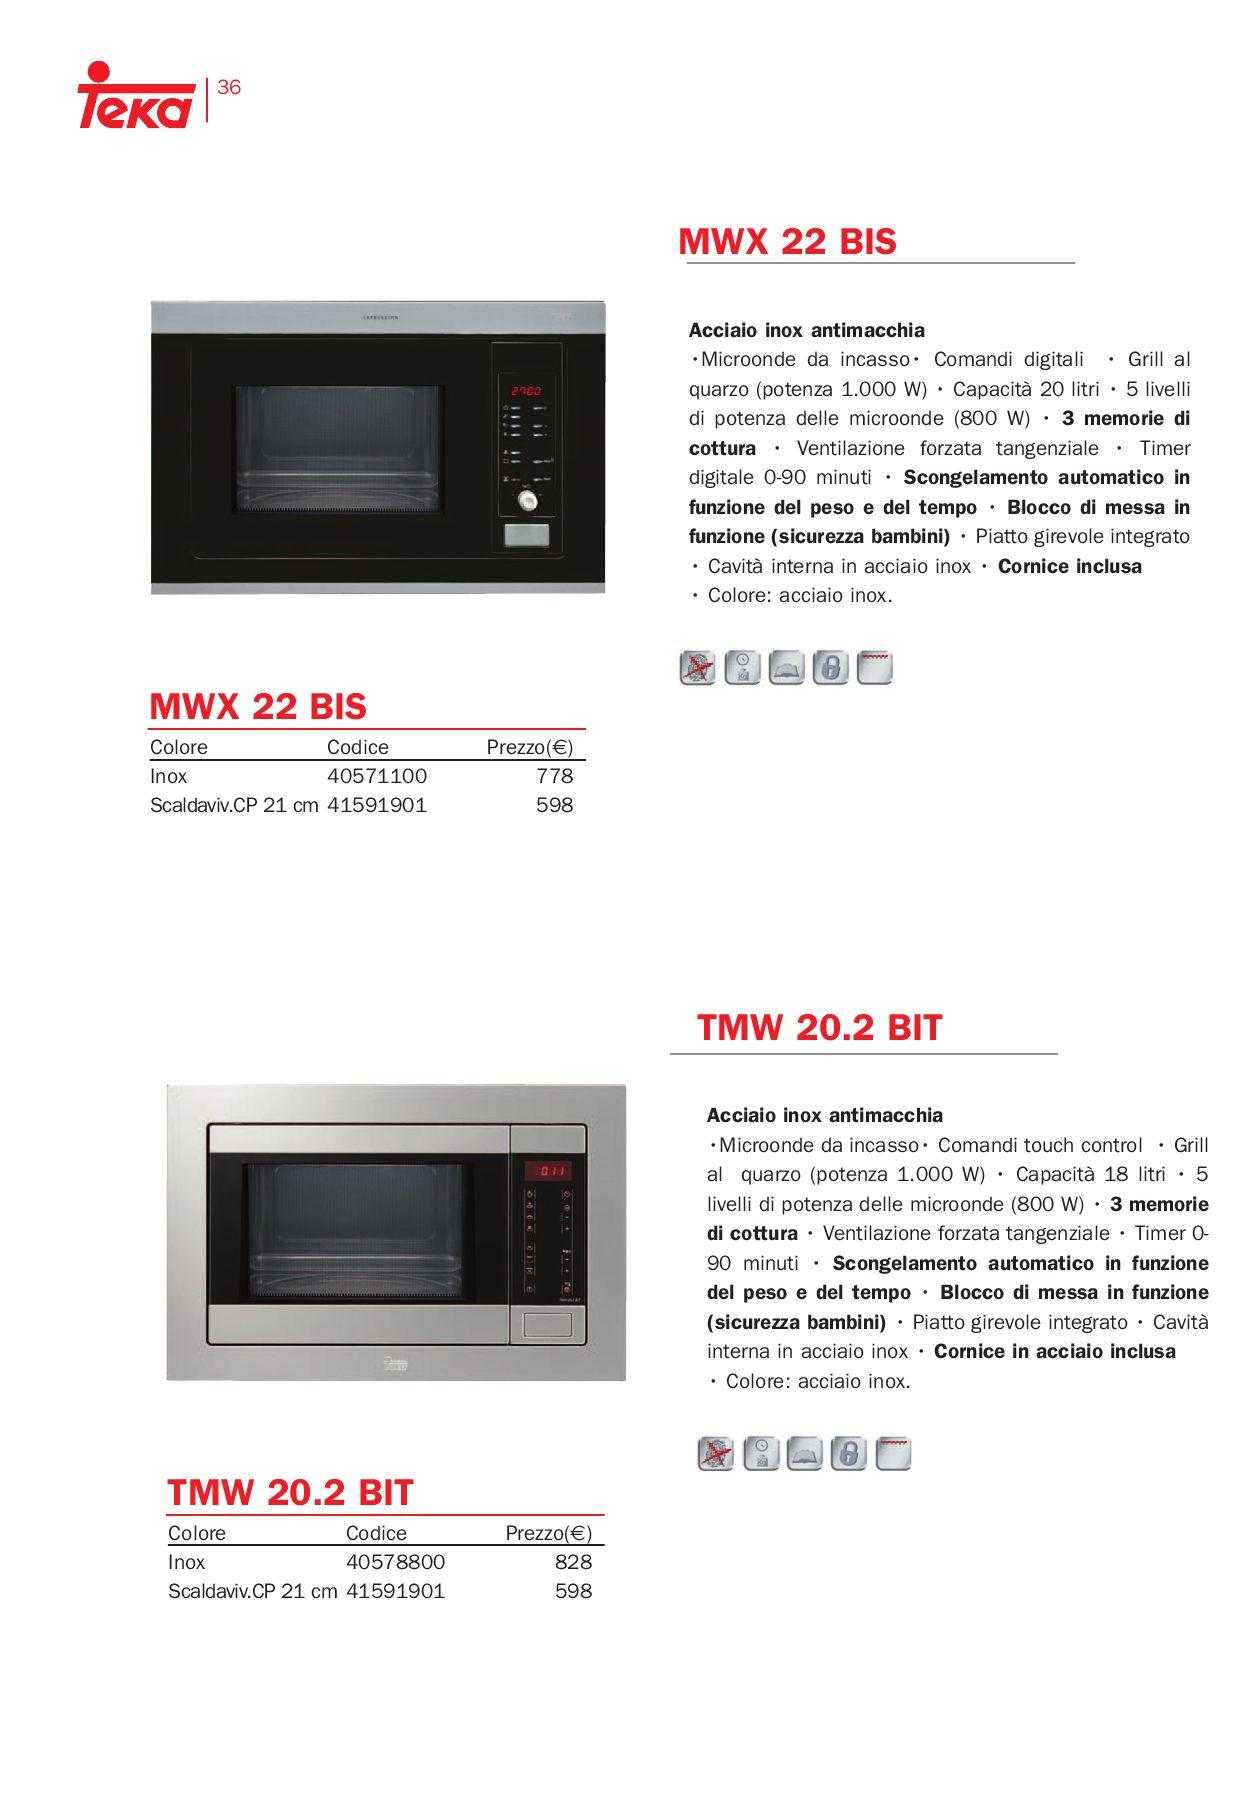 Emejing Microonde Da Incasso Prezzi Photos - Lepicentre.info ...